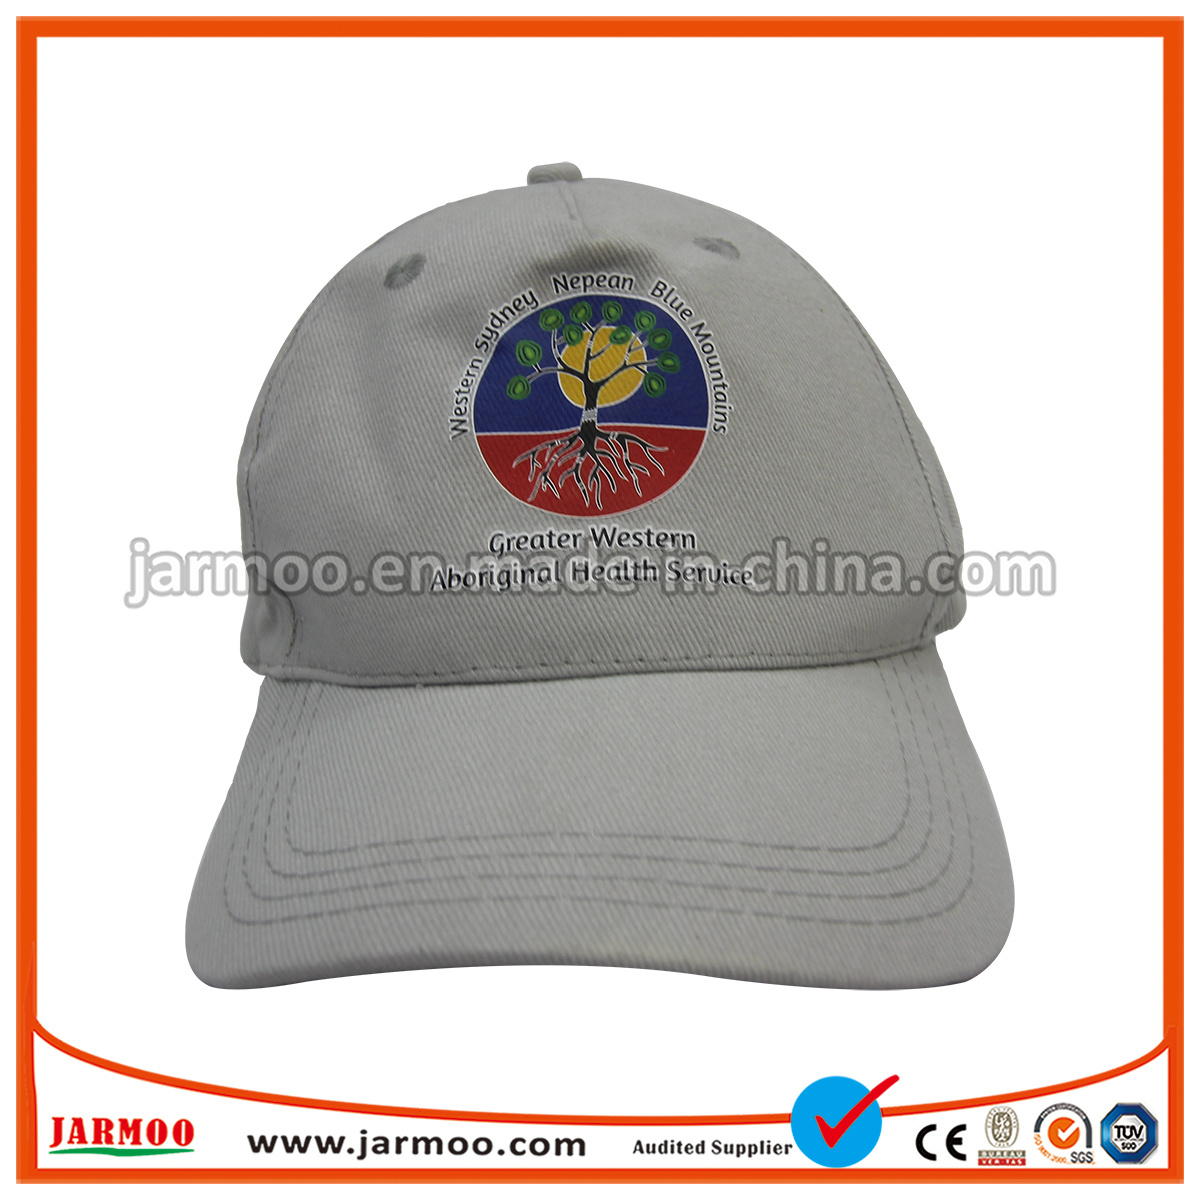 7c12d40fe158f Wholesale Hats 100% Cotton Customized Promotional 5 6 Panel Plain Sports  Baseball Cap Hat